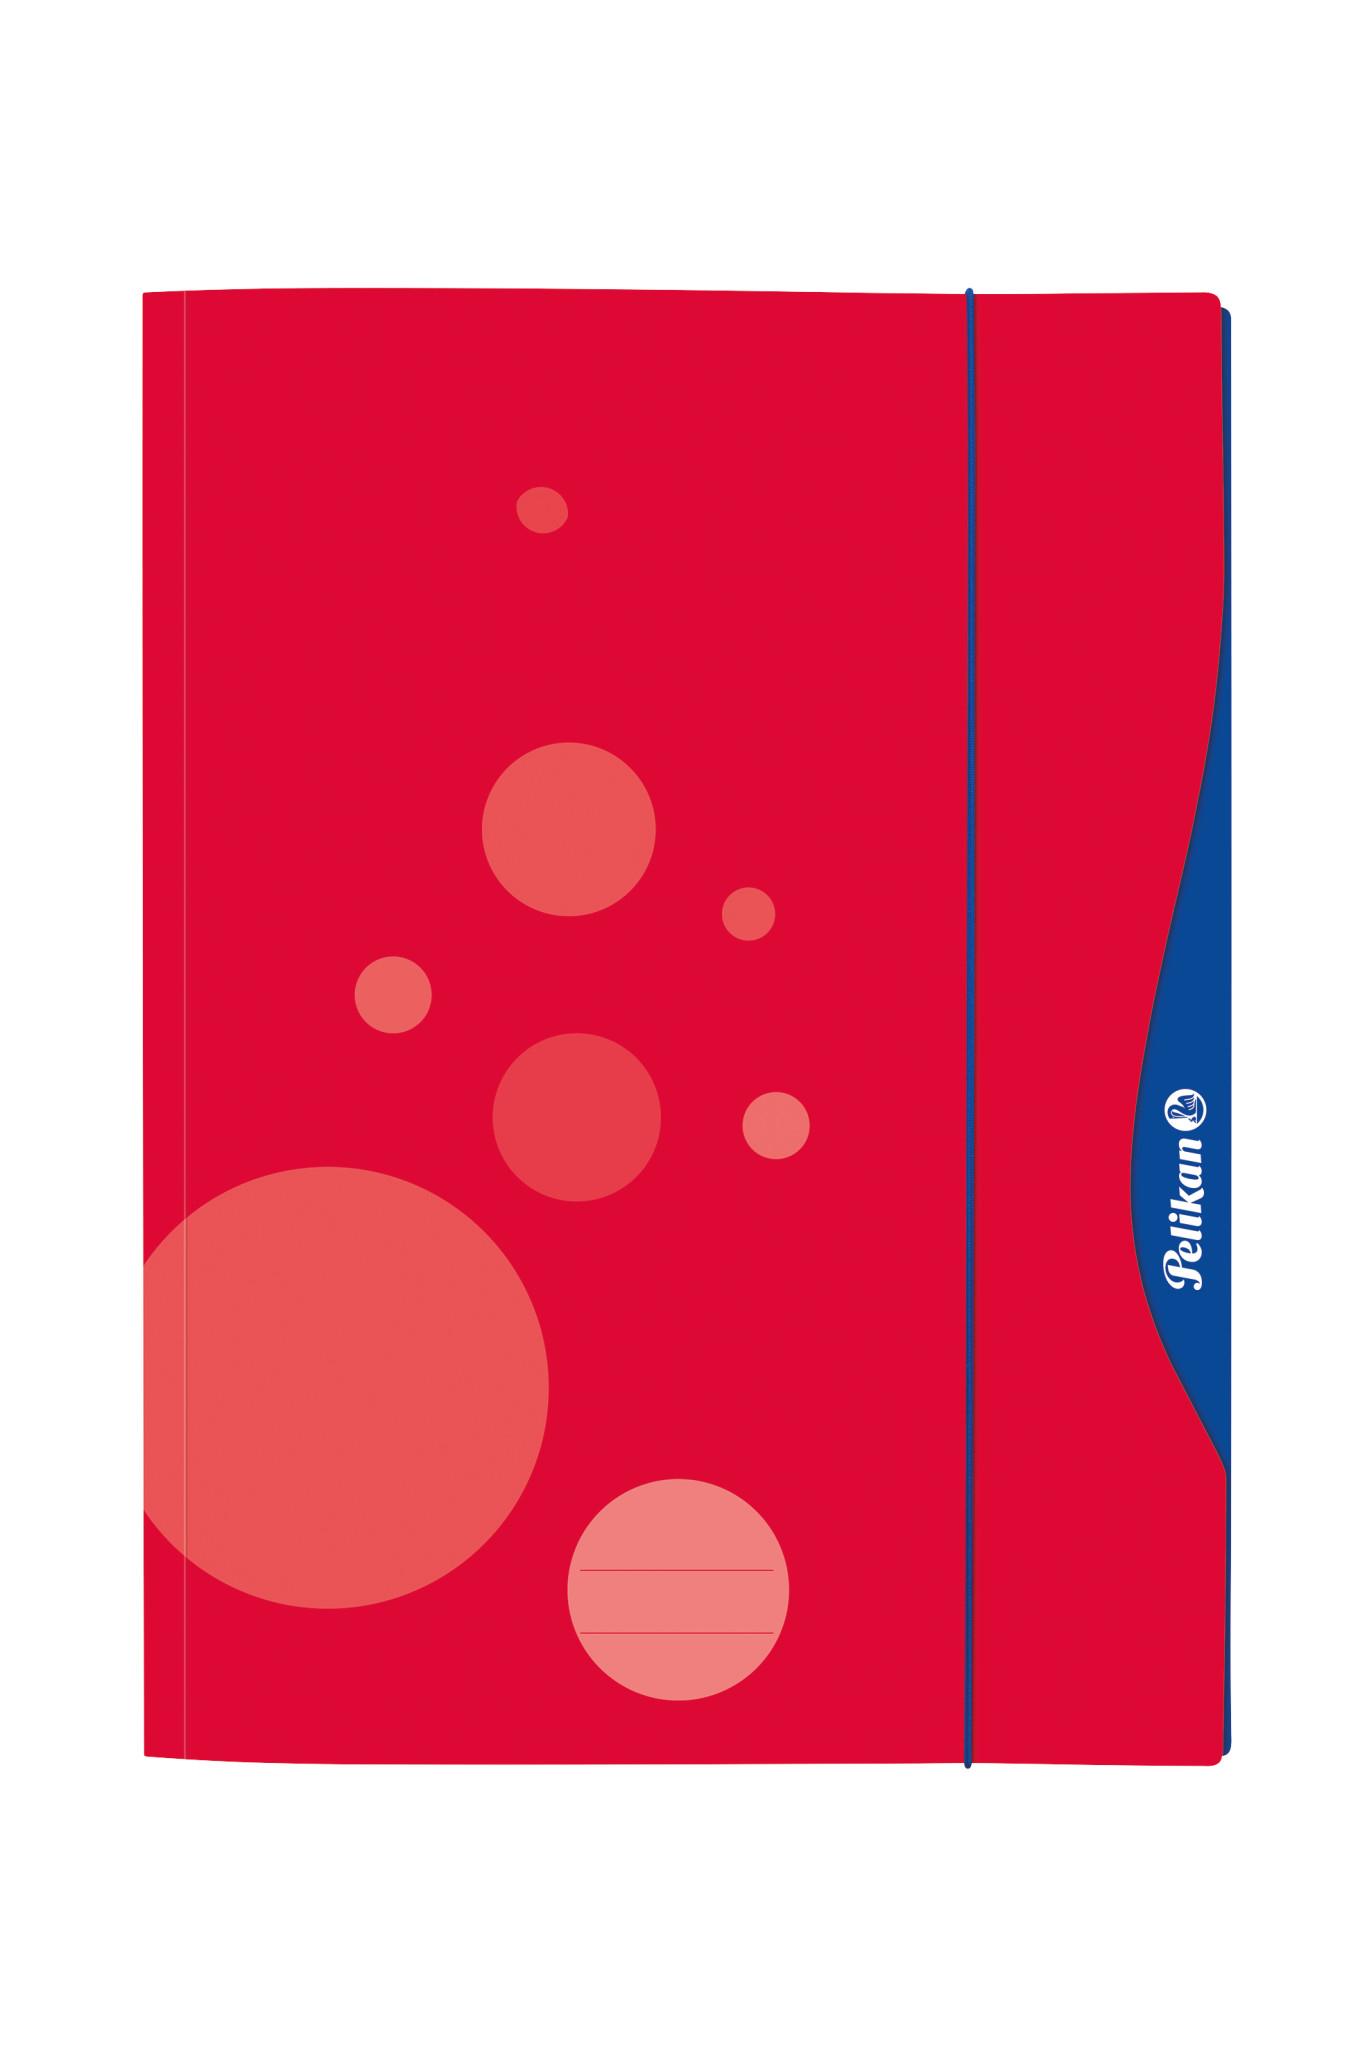 Pelikan 237284 - A3 - Sammelmappe - Rot - Gummiband